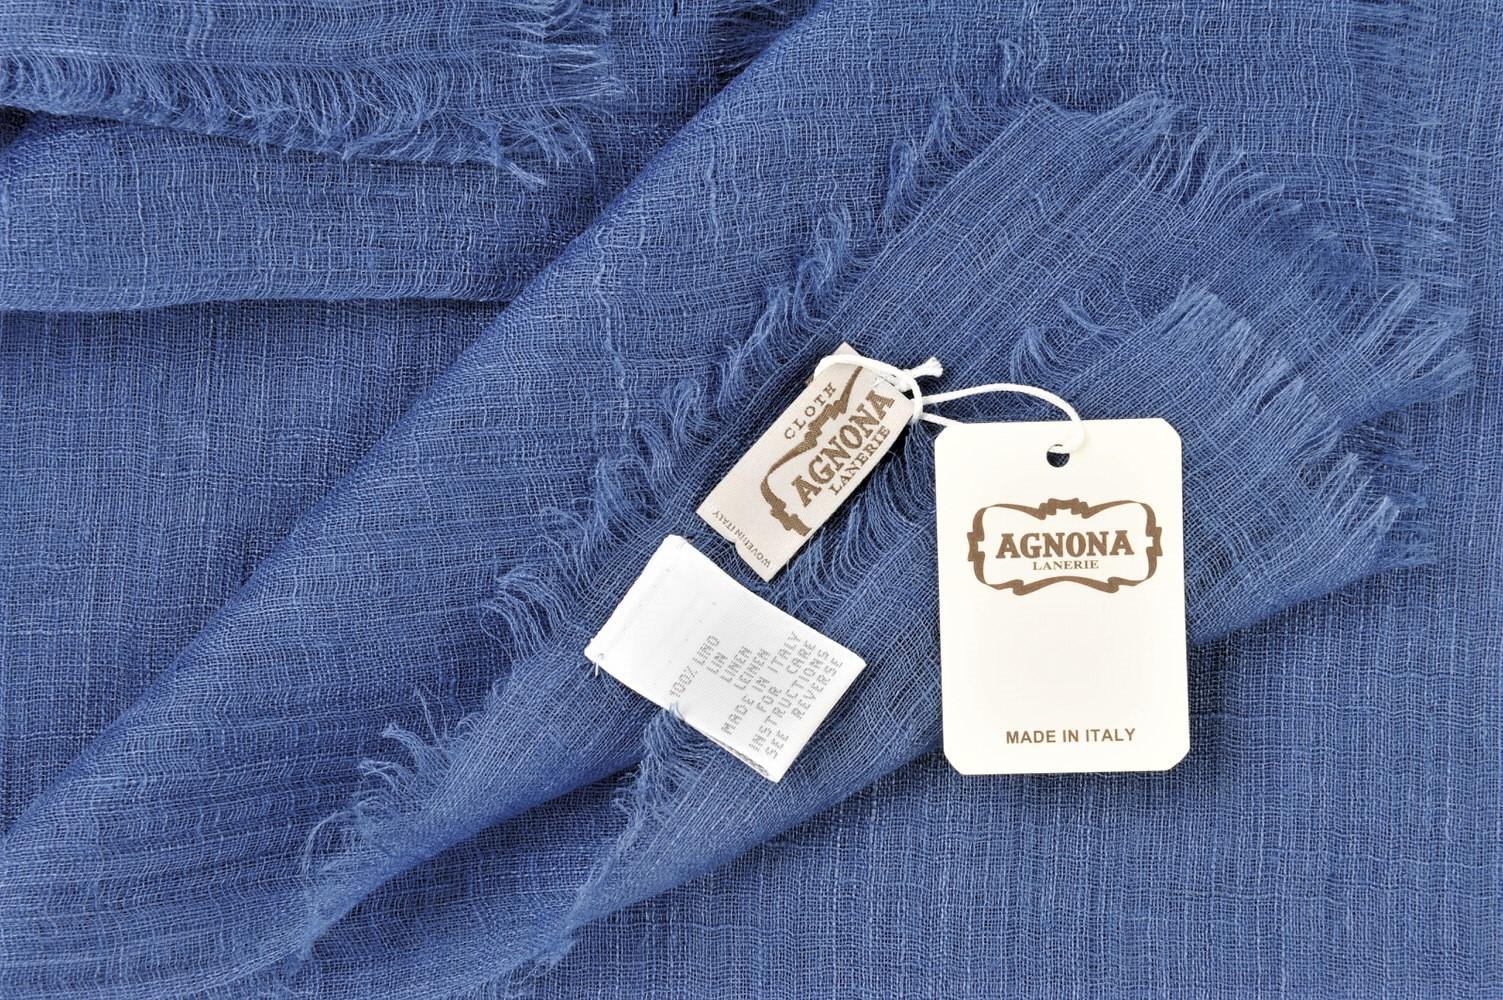 Agnona  Foulard  Blau Leinen   150 cm x 165 cm